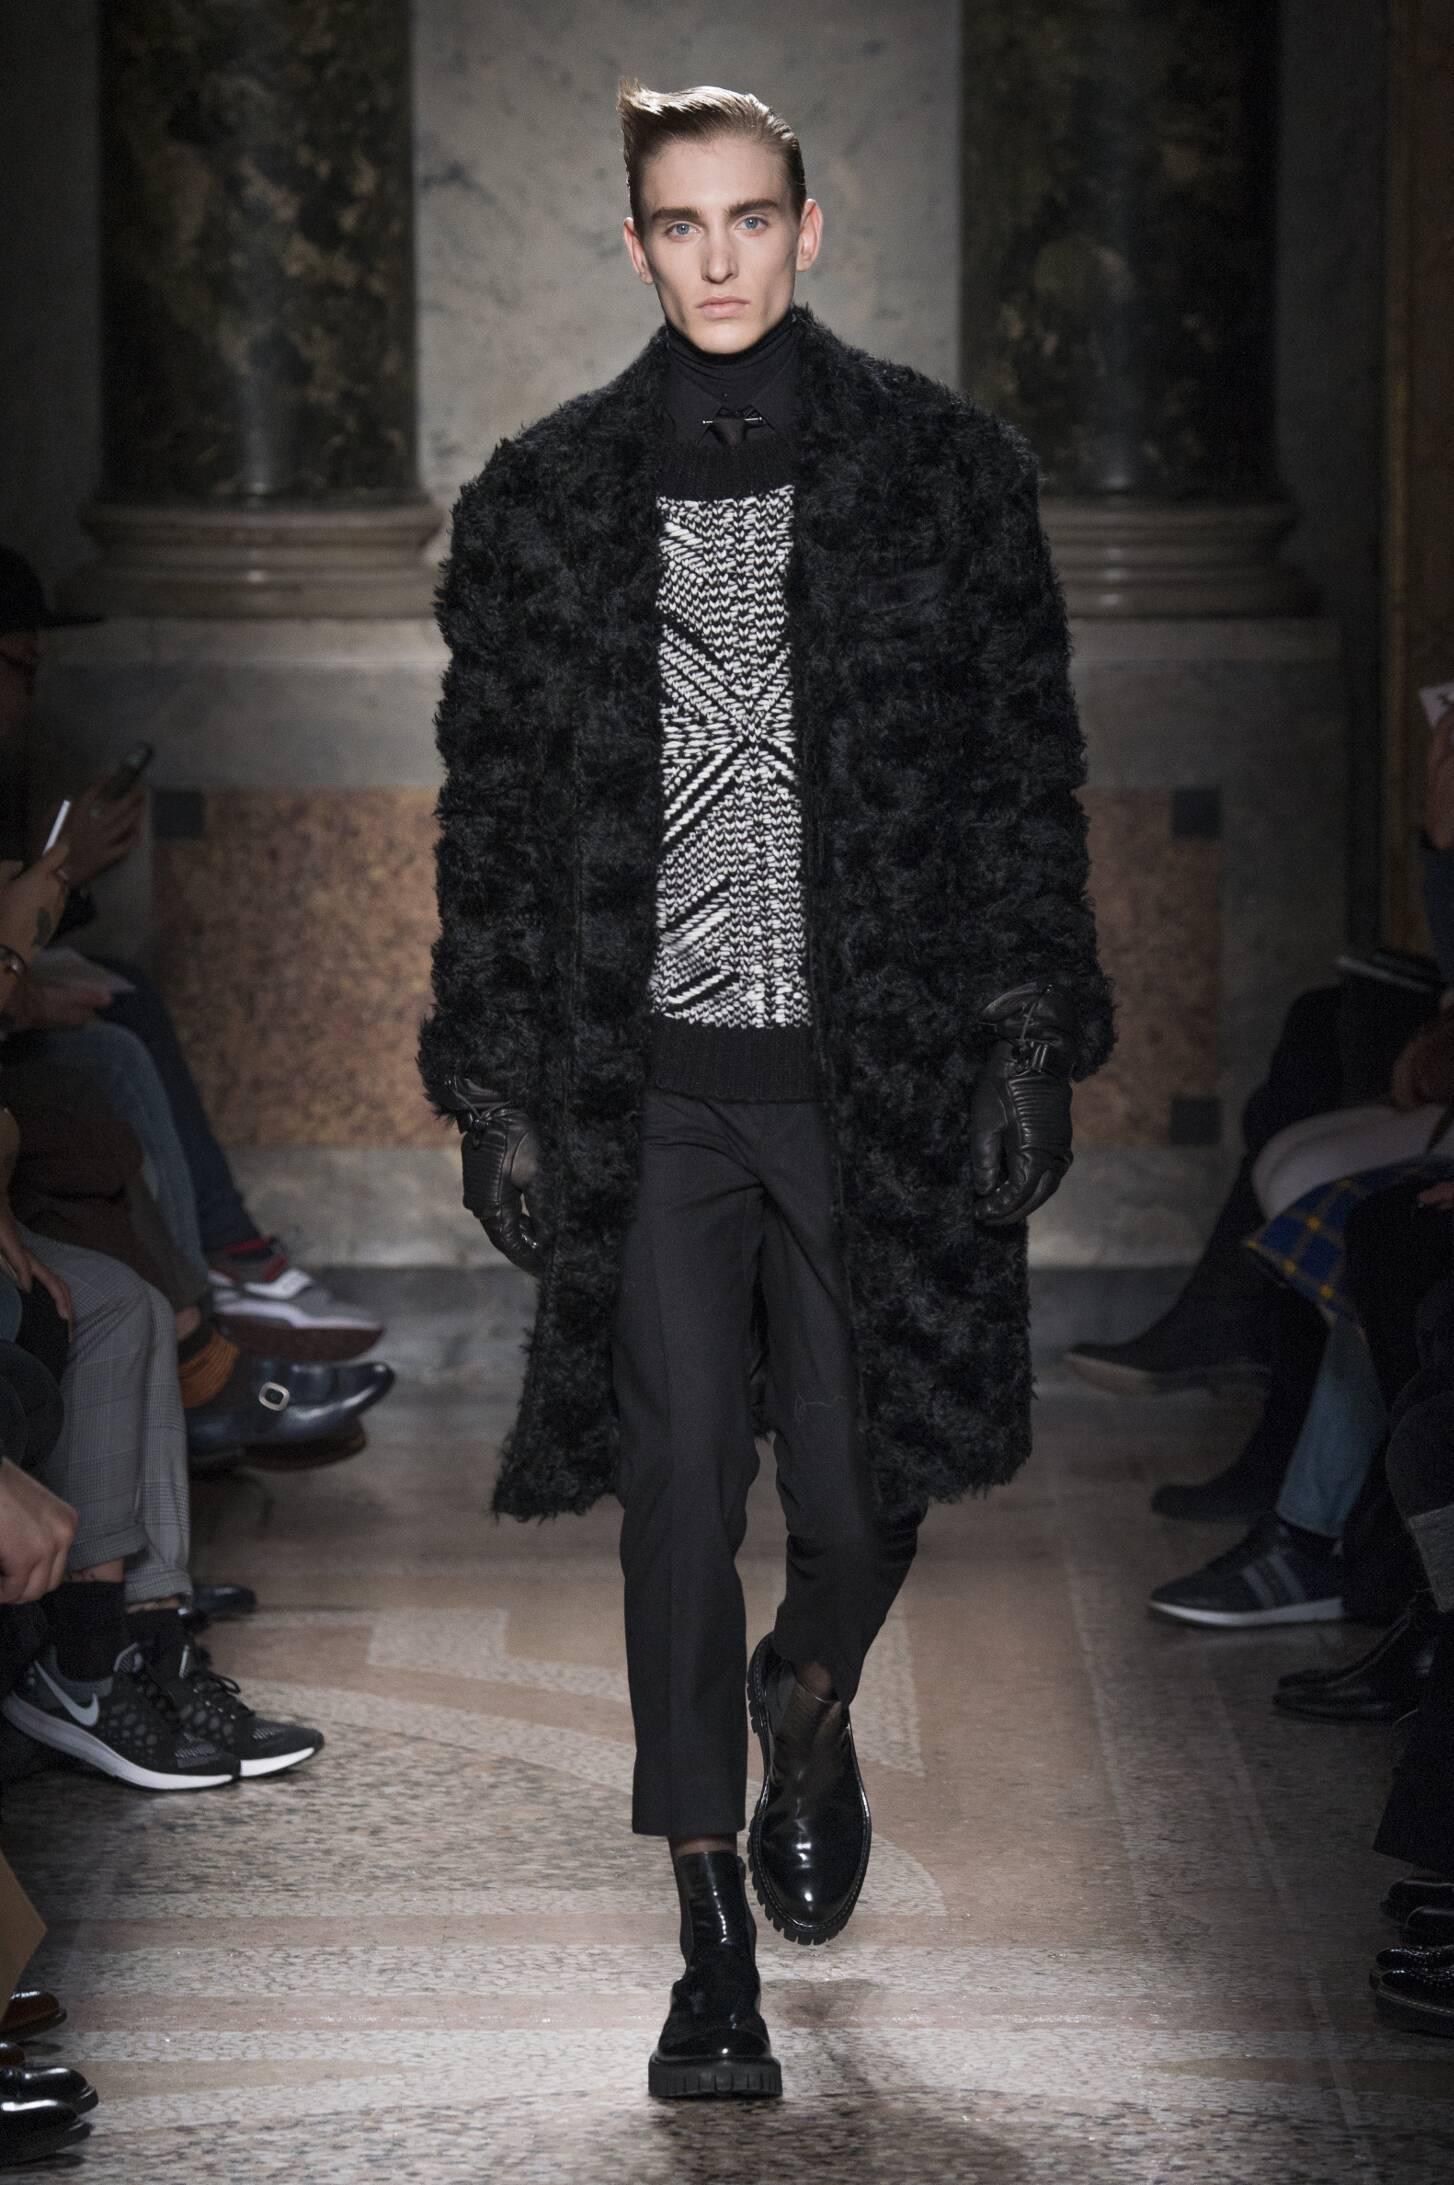 Fashion Winter Trends 2015 2016 Les Hommes